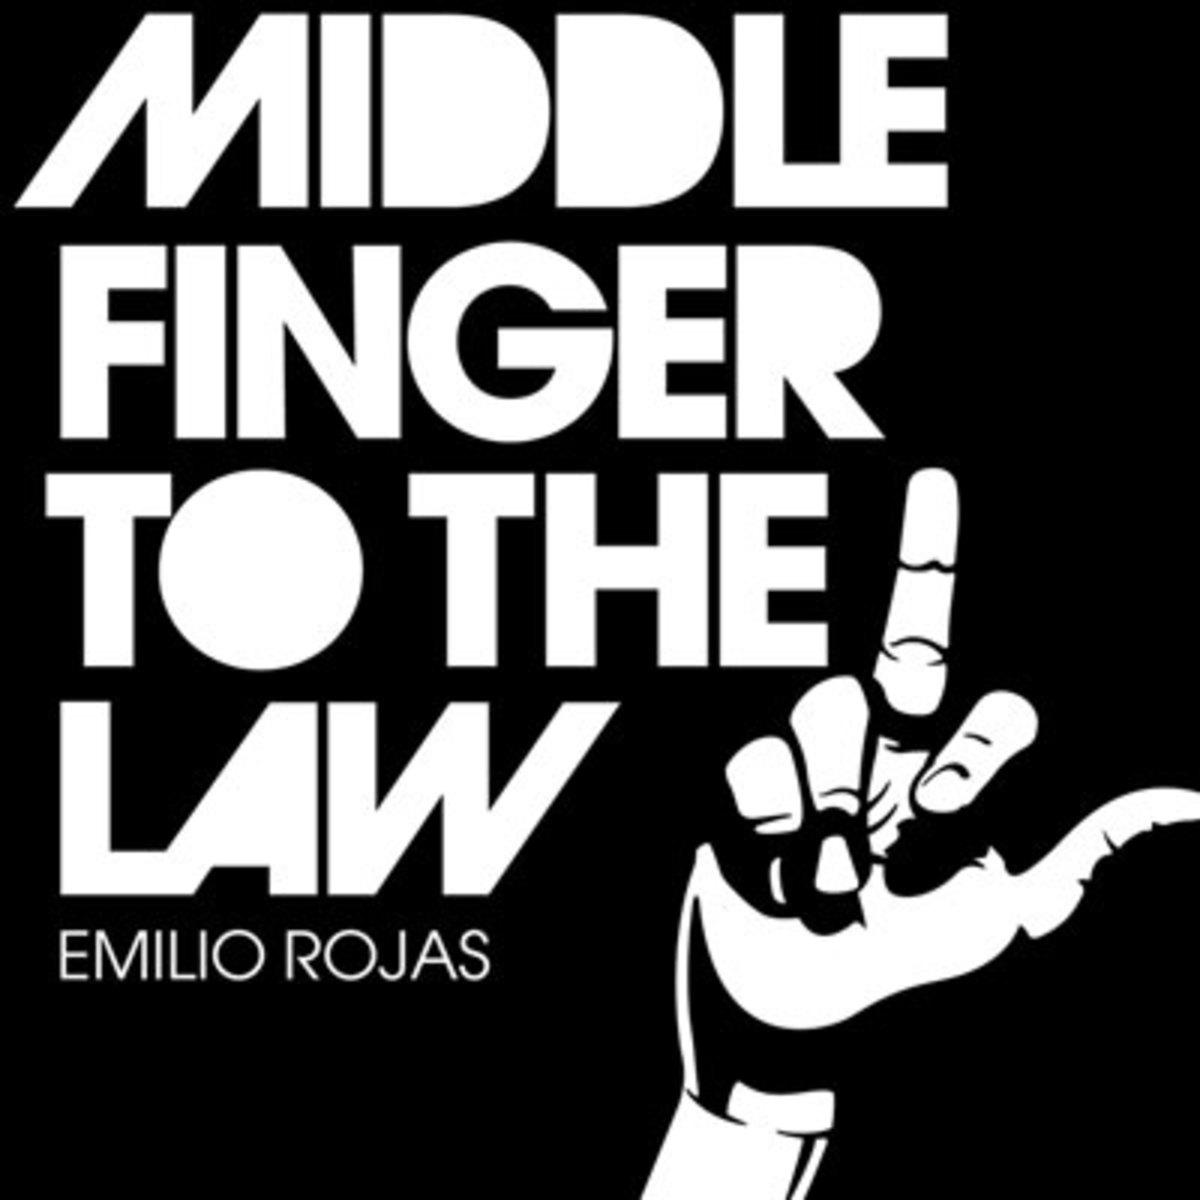 emiliorojas-middlefinger.jpg